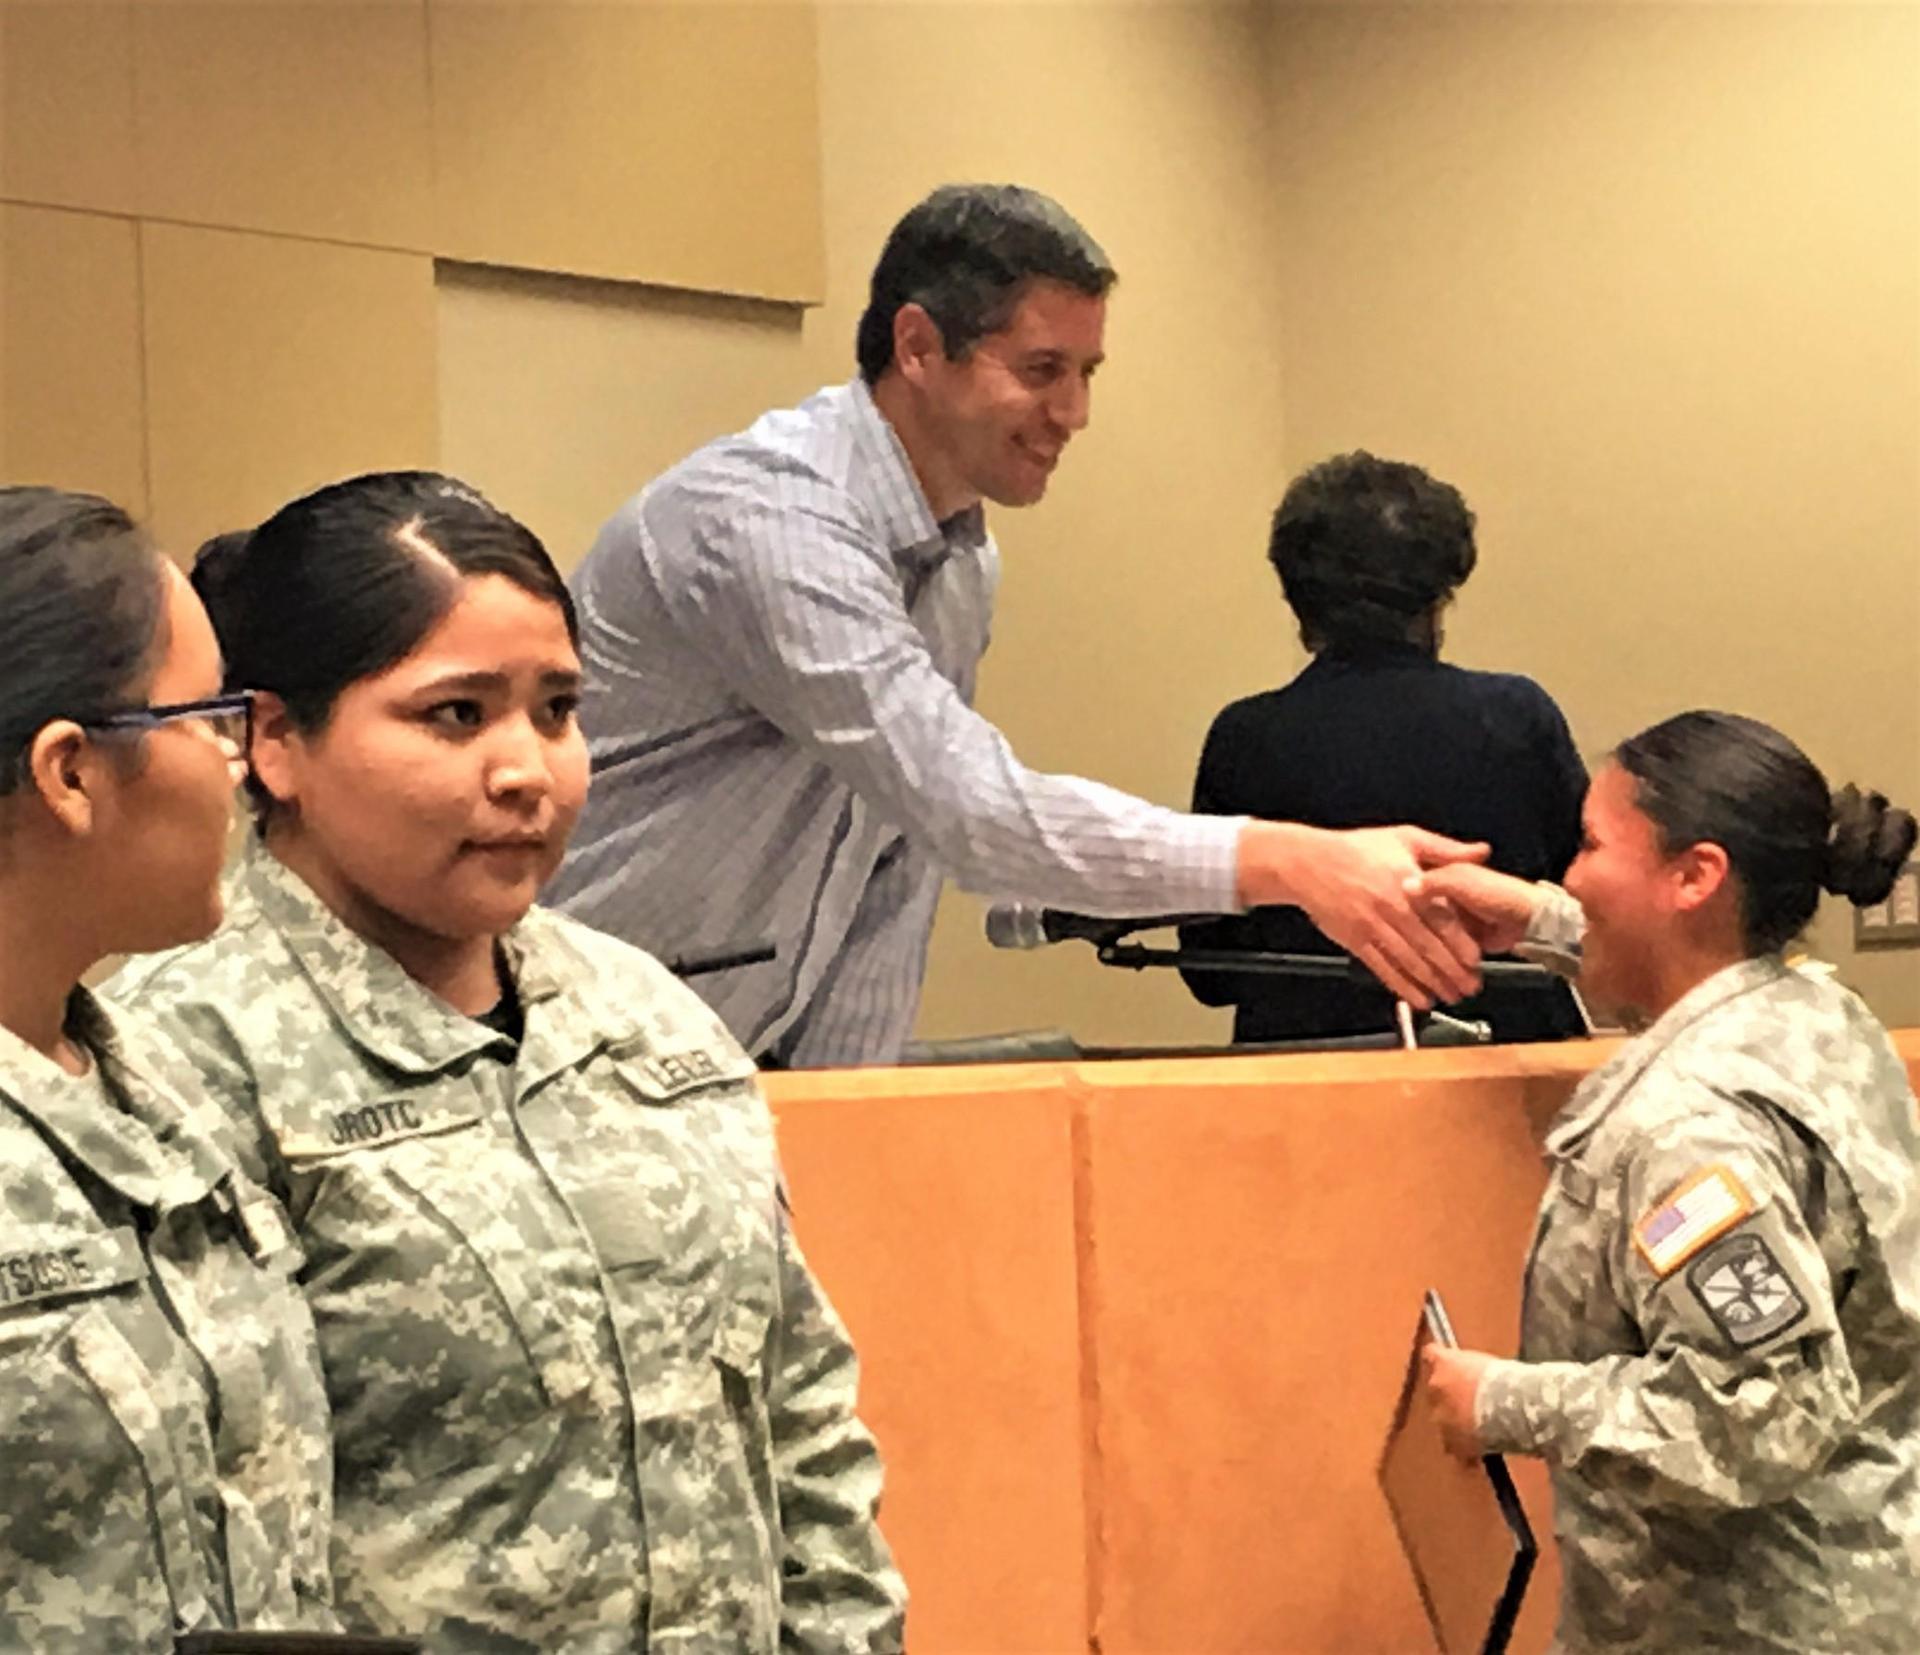 Superintendent Mr. Hyatt congratulating a JROTC Cadet